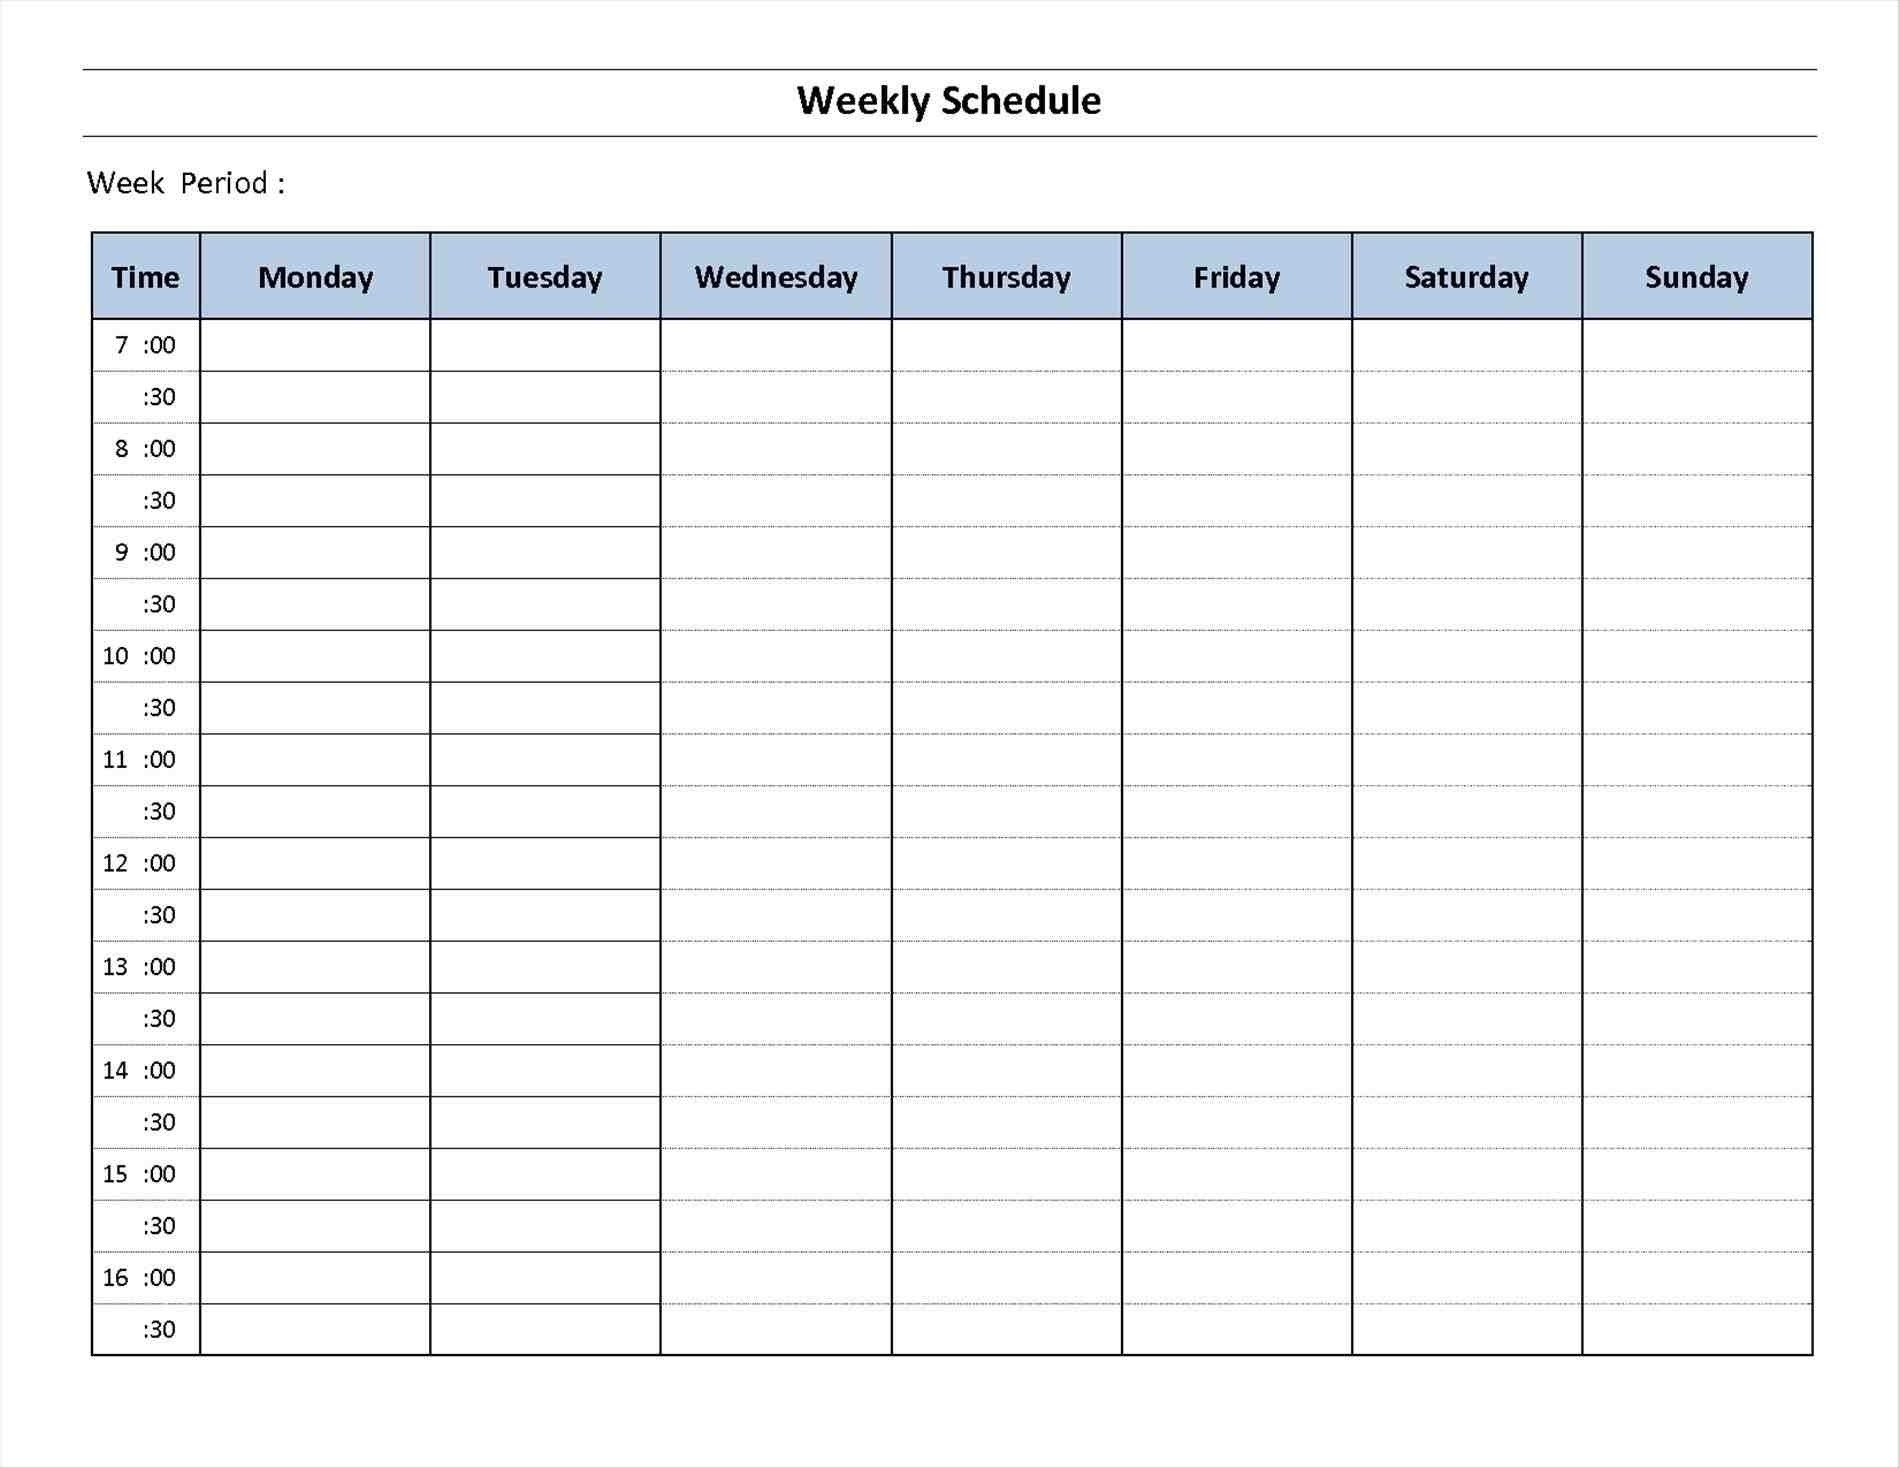 Schedule Template Ay Planner Week Calendar Printable Excel Word Free intended for 7 Day Weekly Planner Template Printable